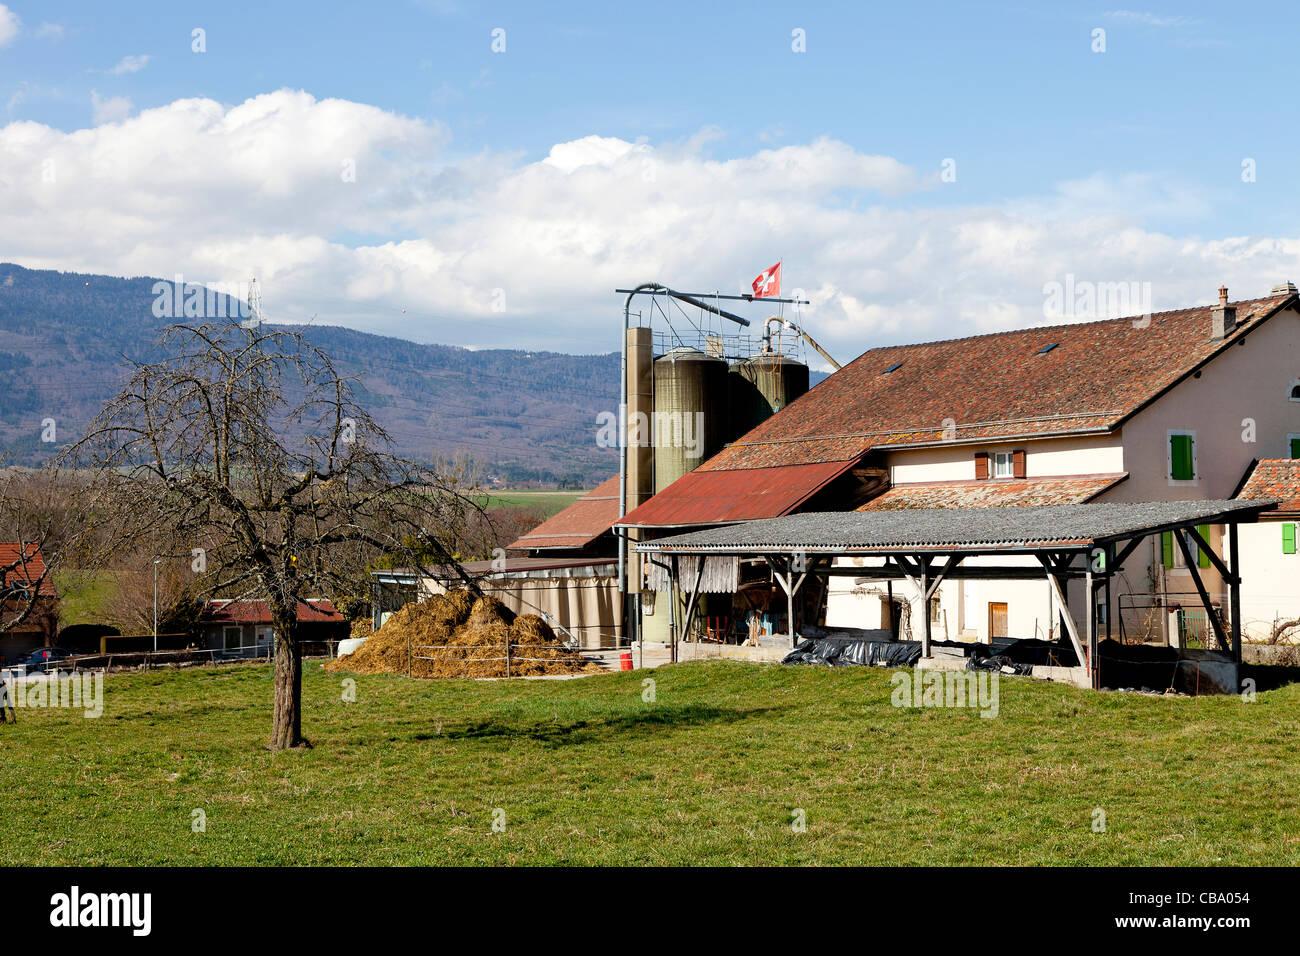 Farm buildings at Nyon, Vaud, Switzerland - Stock Image